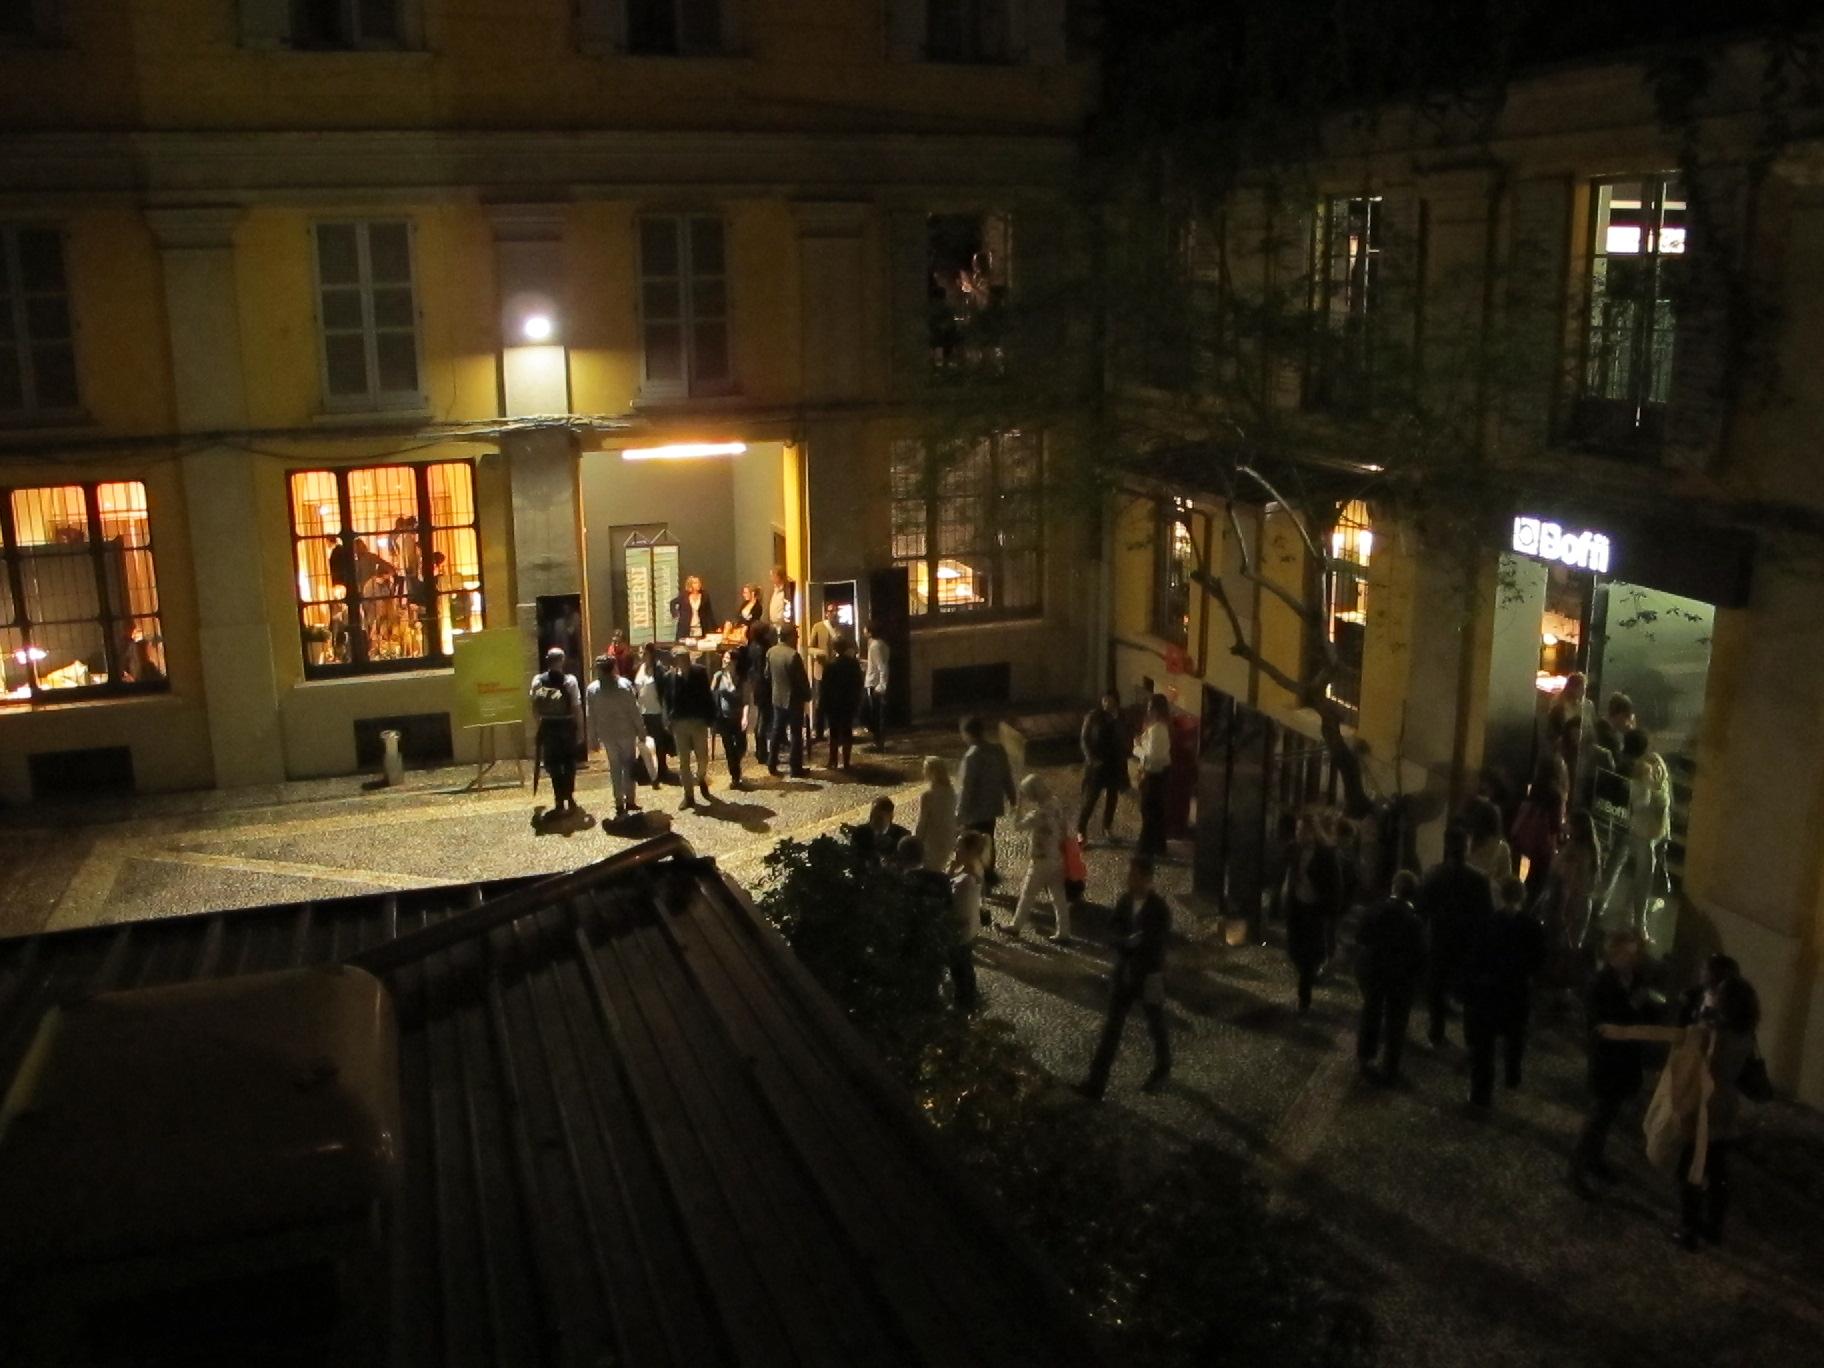 Salon du meuble de Milan 2011: soirée à Brera